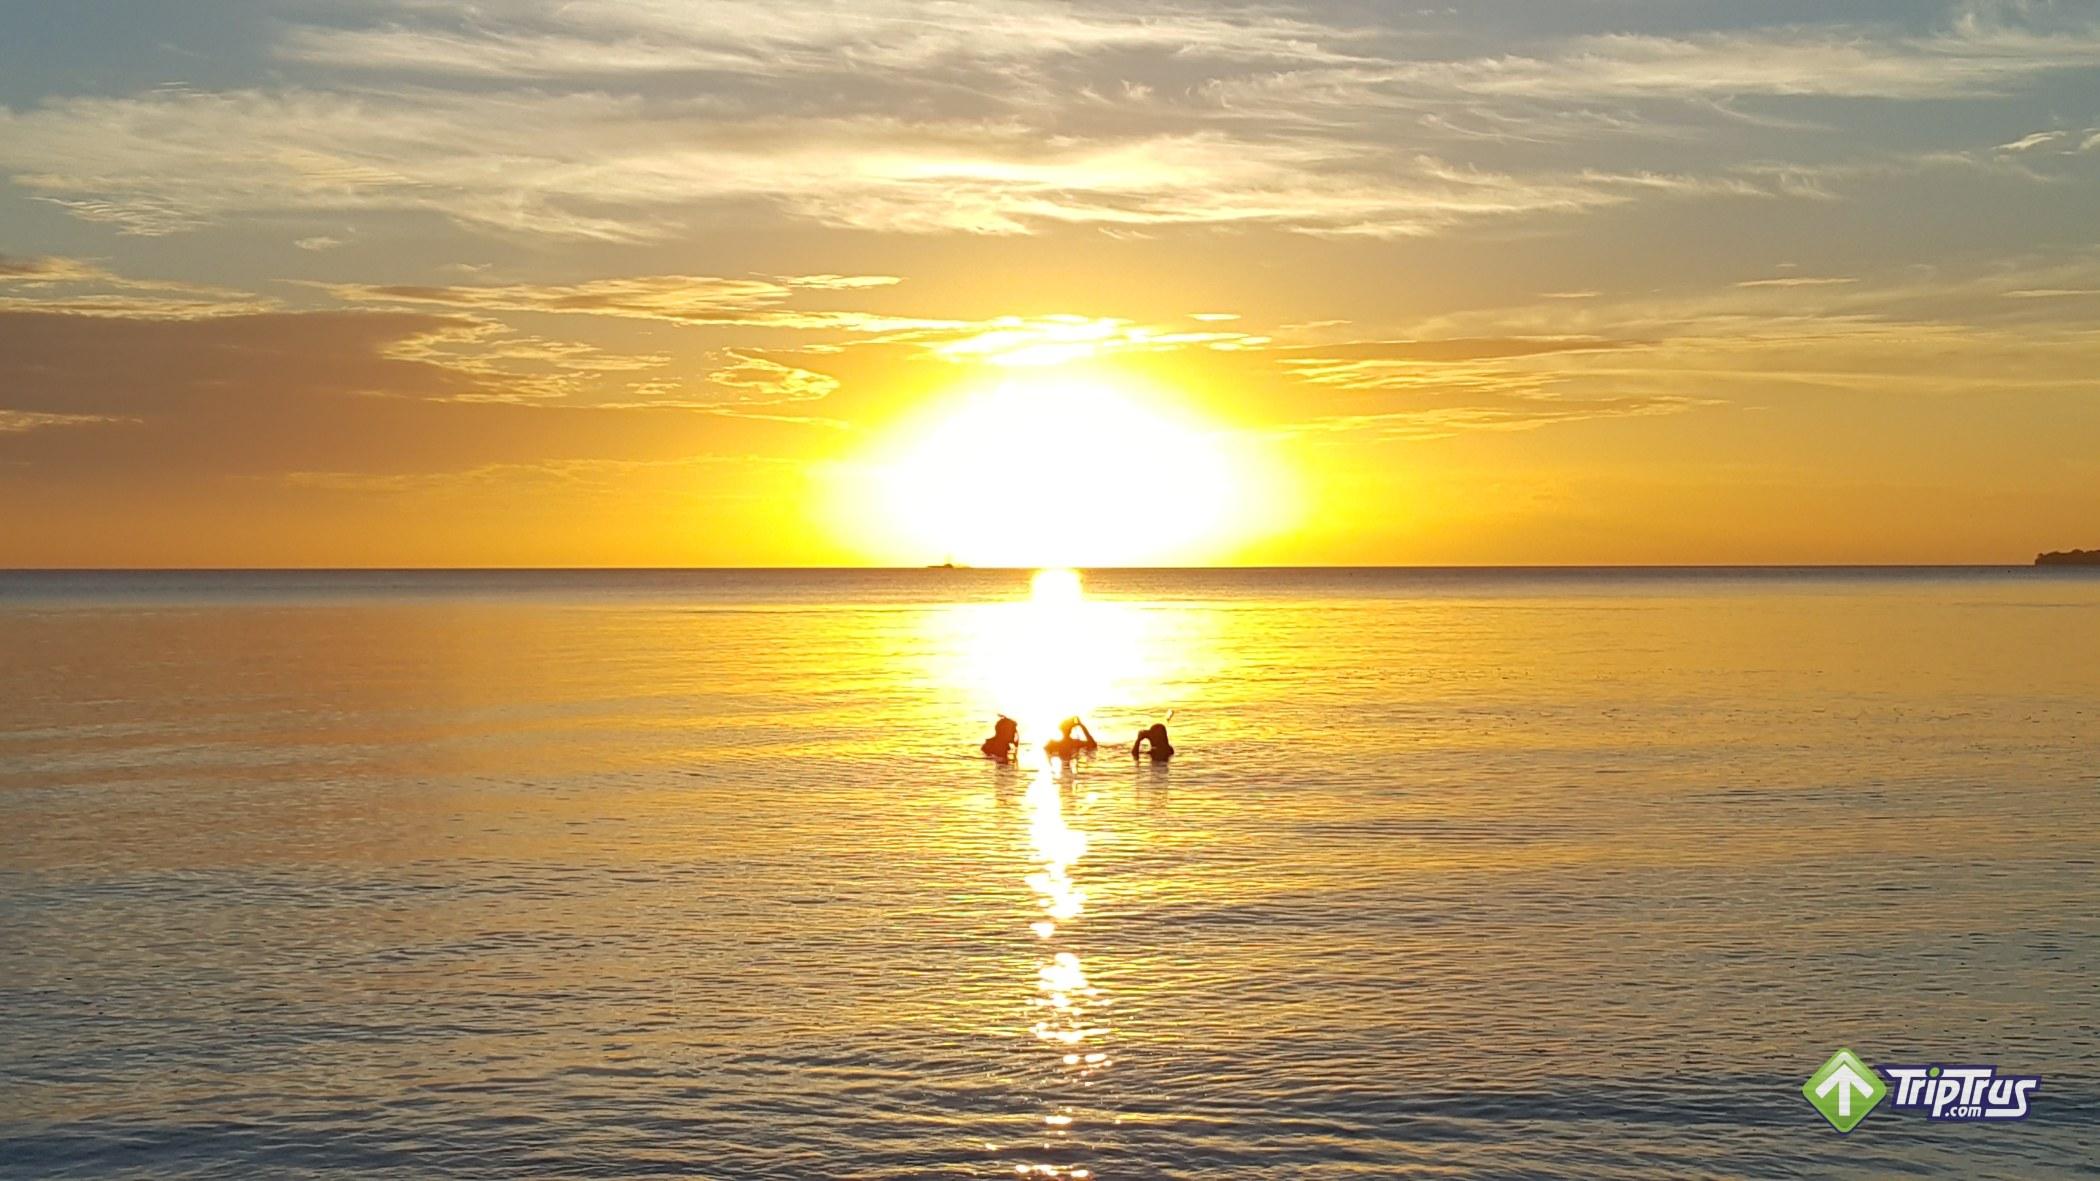 Pantai Ngur Sardanan, Ohoiilir, Kei, Maluku